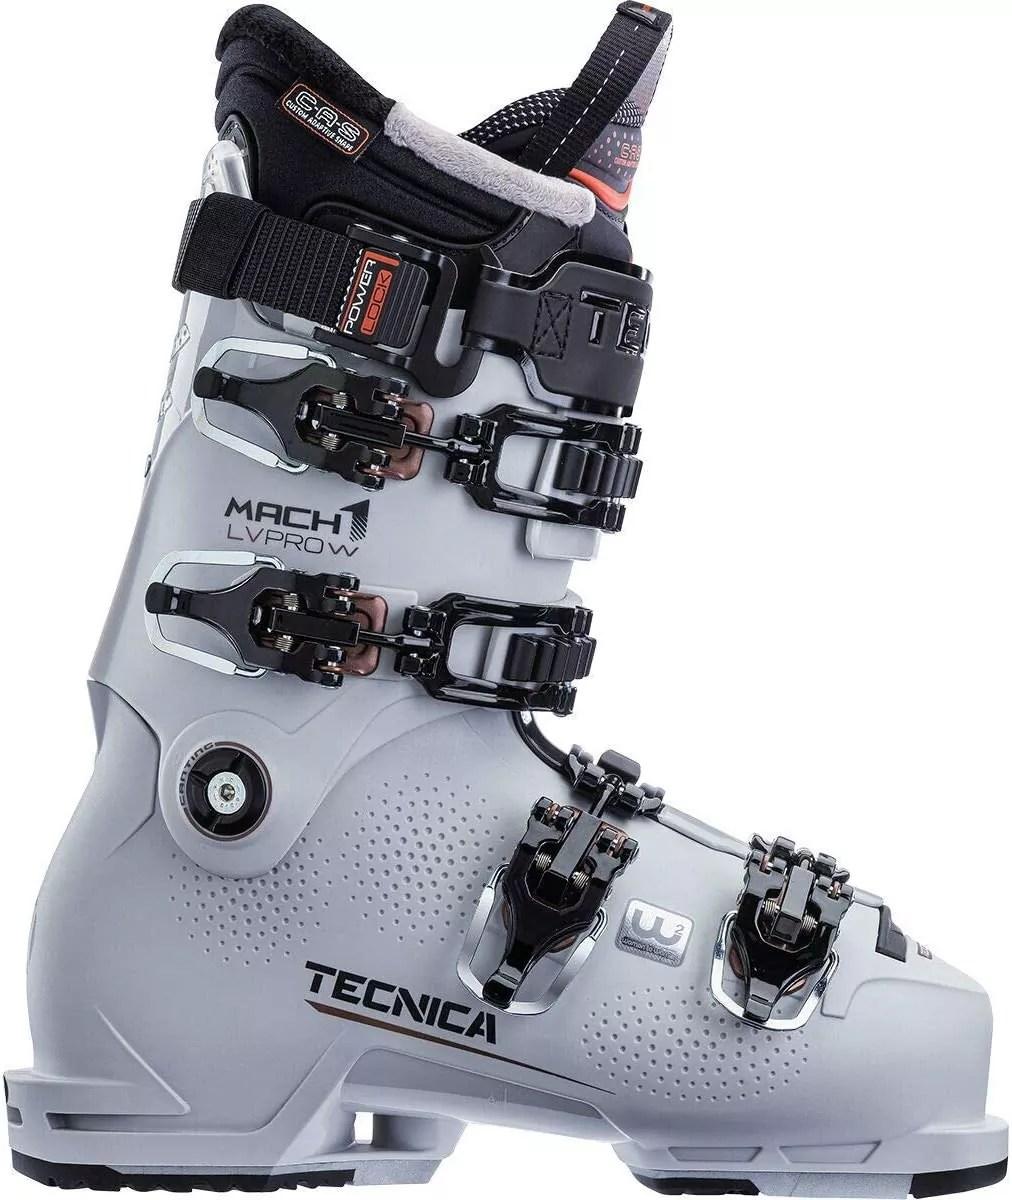 Tecnica Mach1 LV Pro W Ski Boots – Women